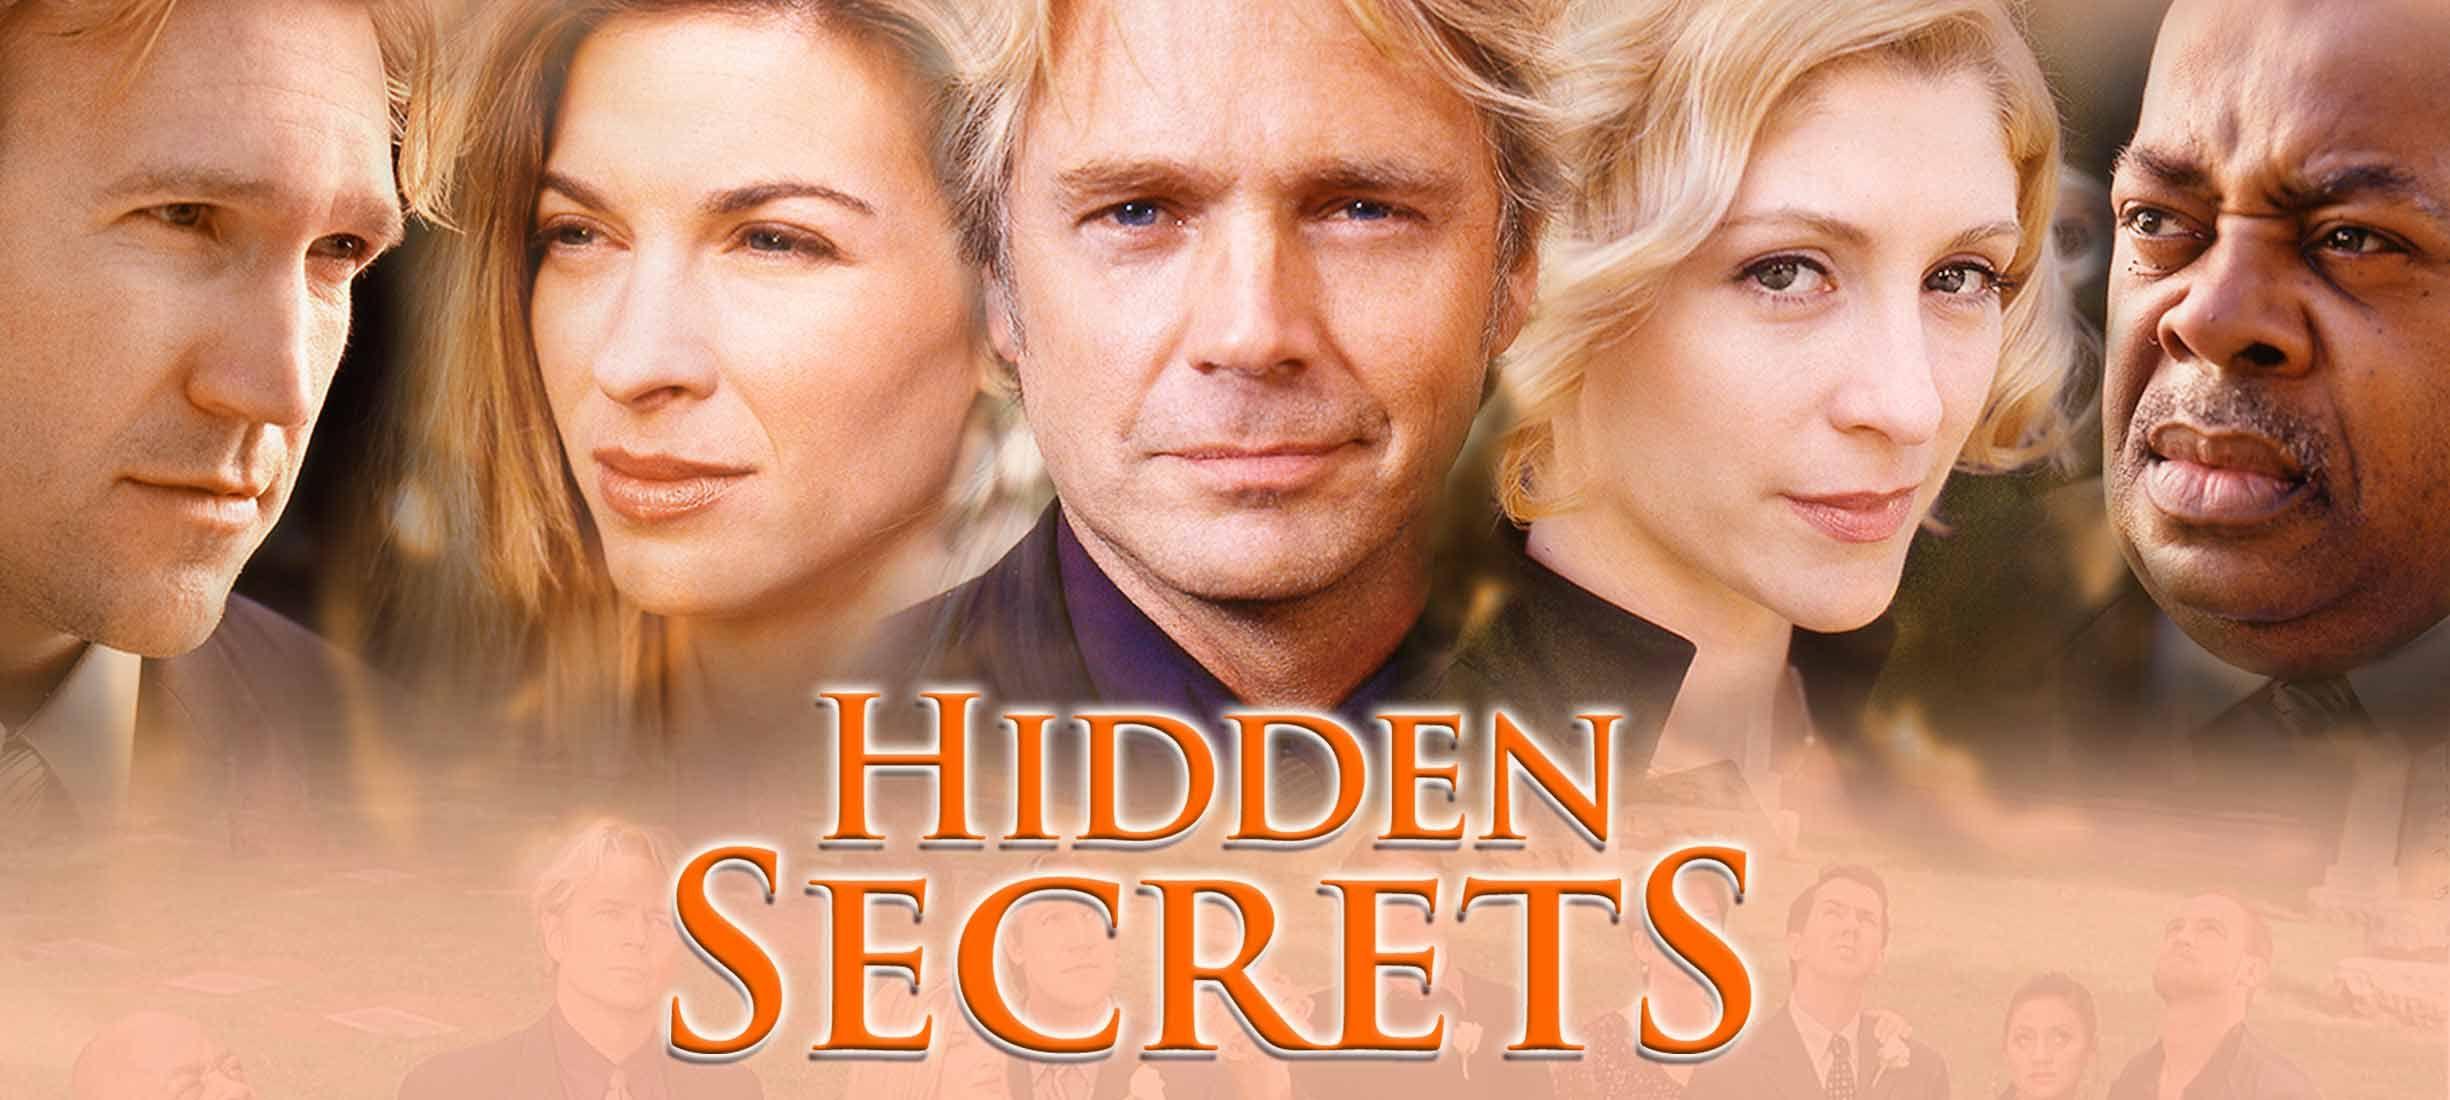 Watch Hidden Secrets on The secret, Comedy